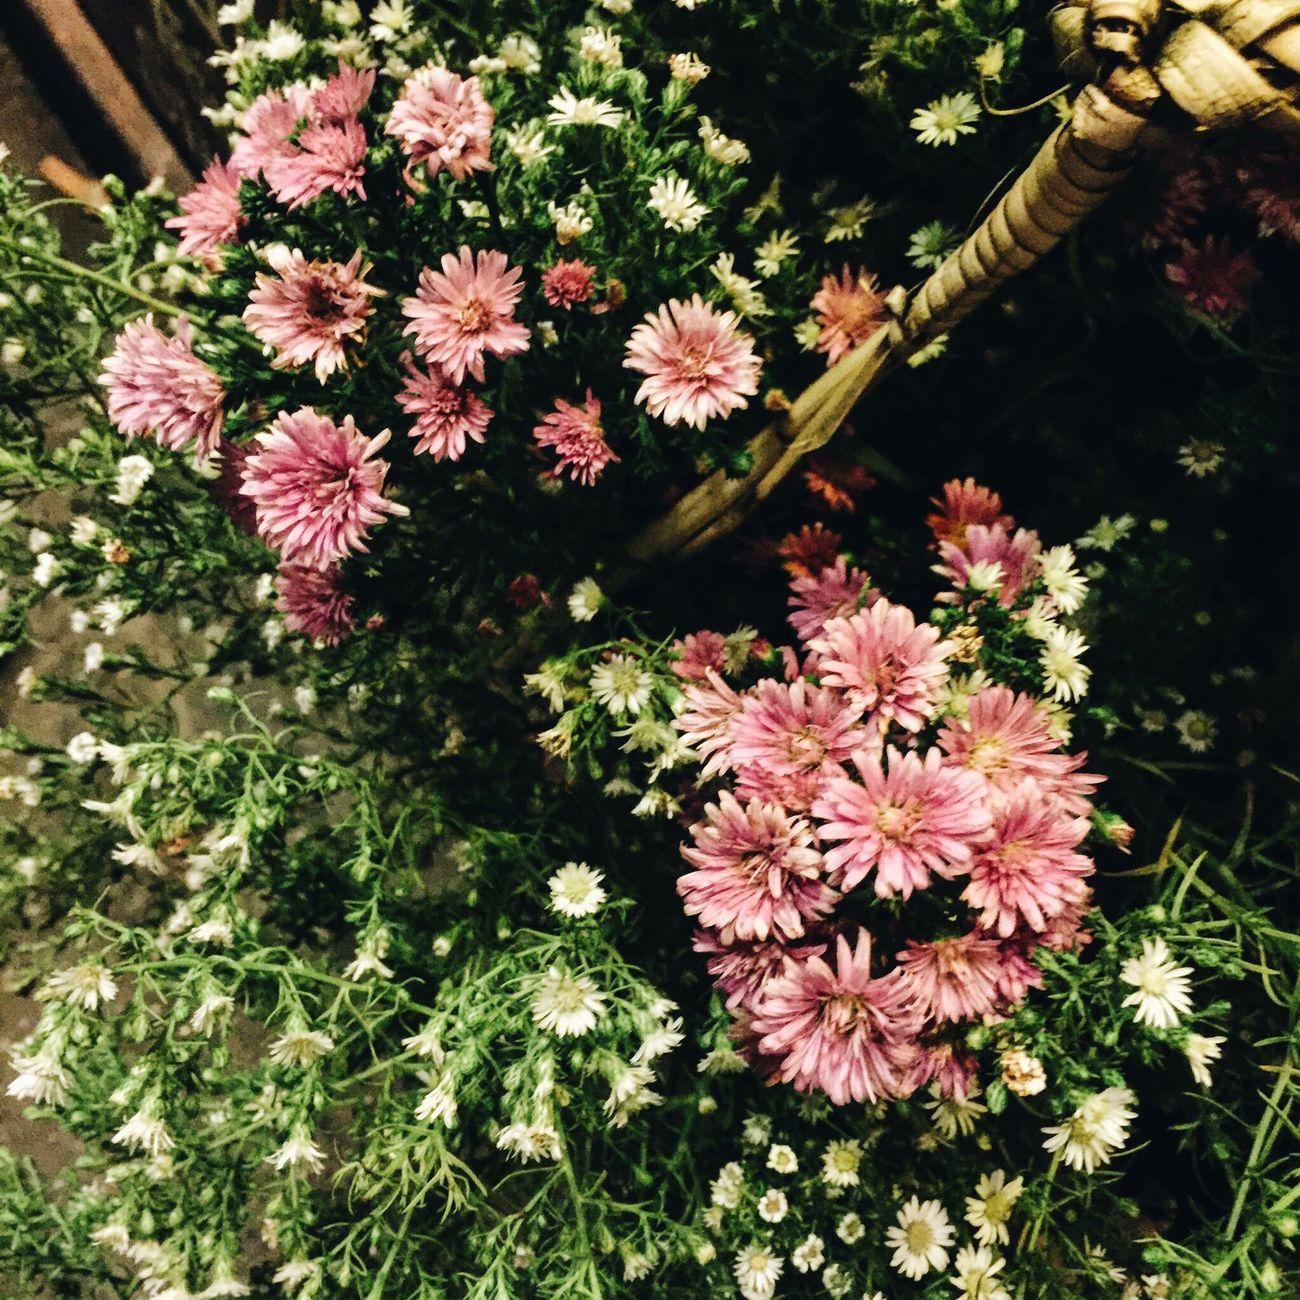 Hoi An Flowera:y] Daisya:freshness] Speciality Of Vietnam